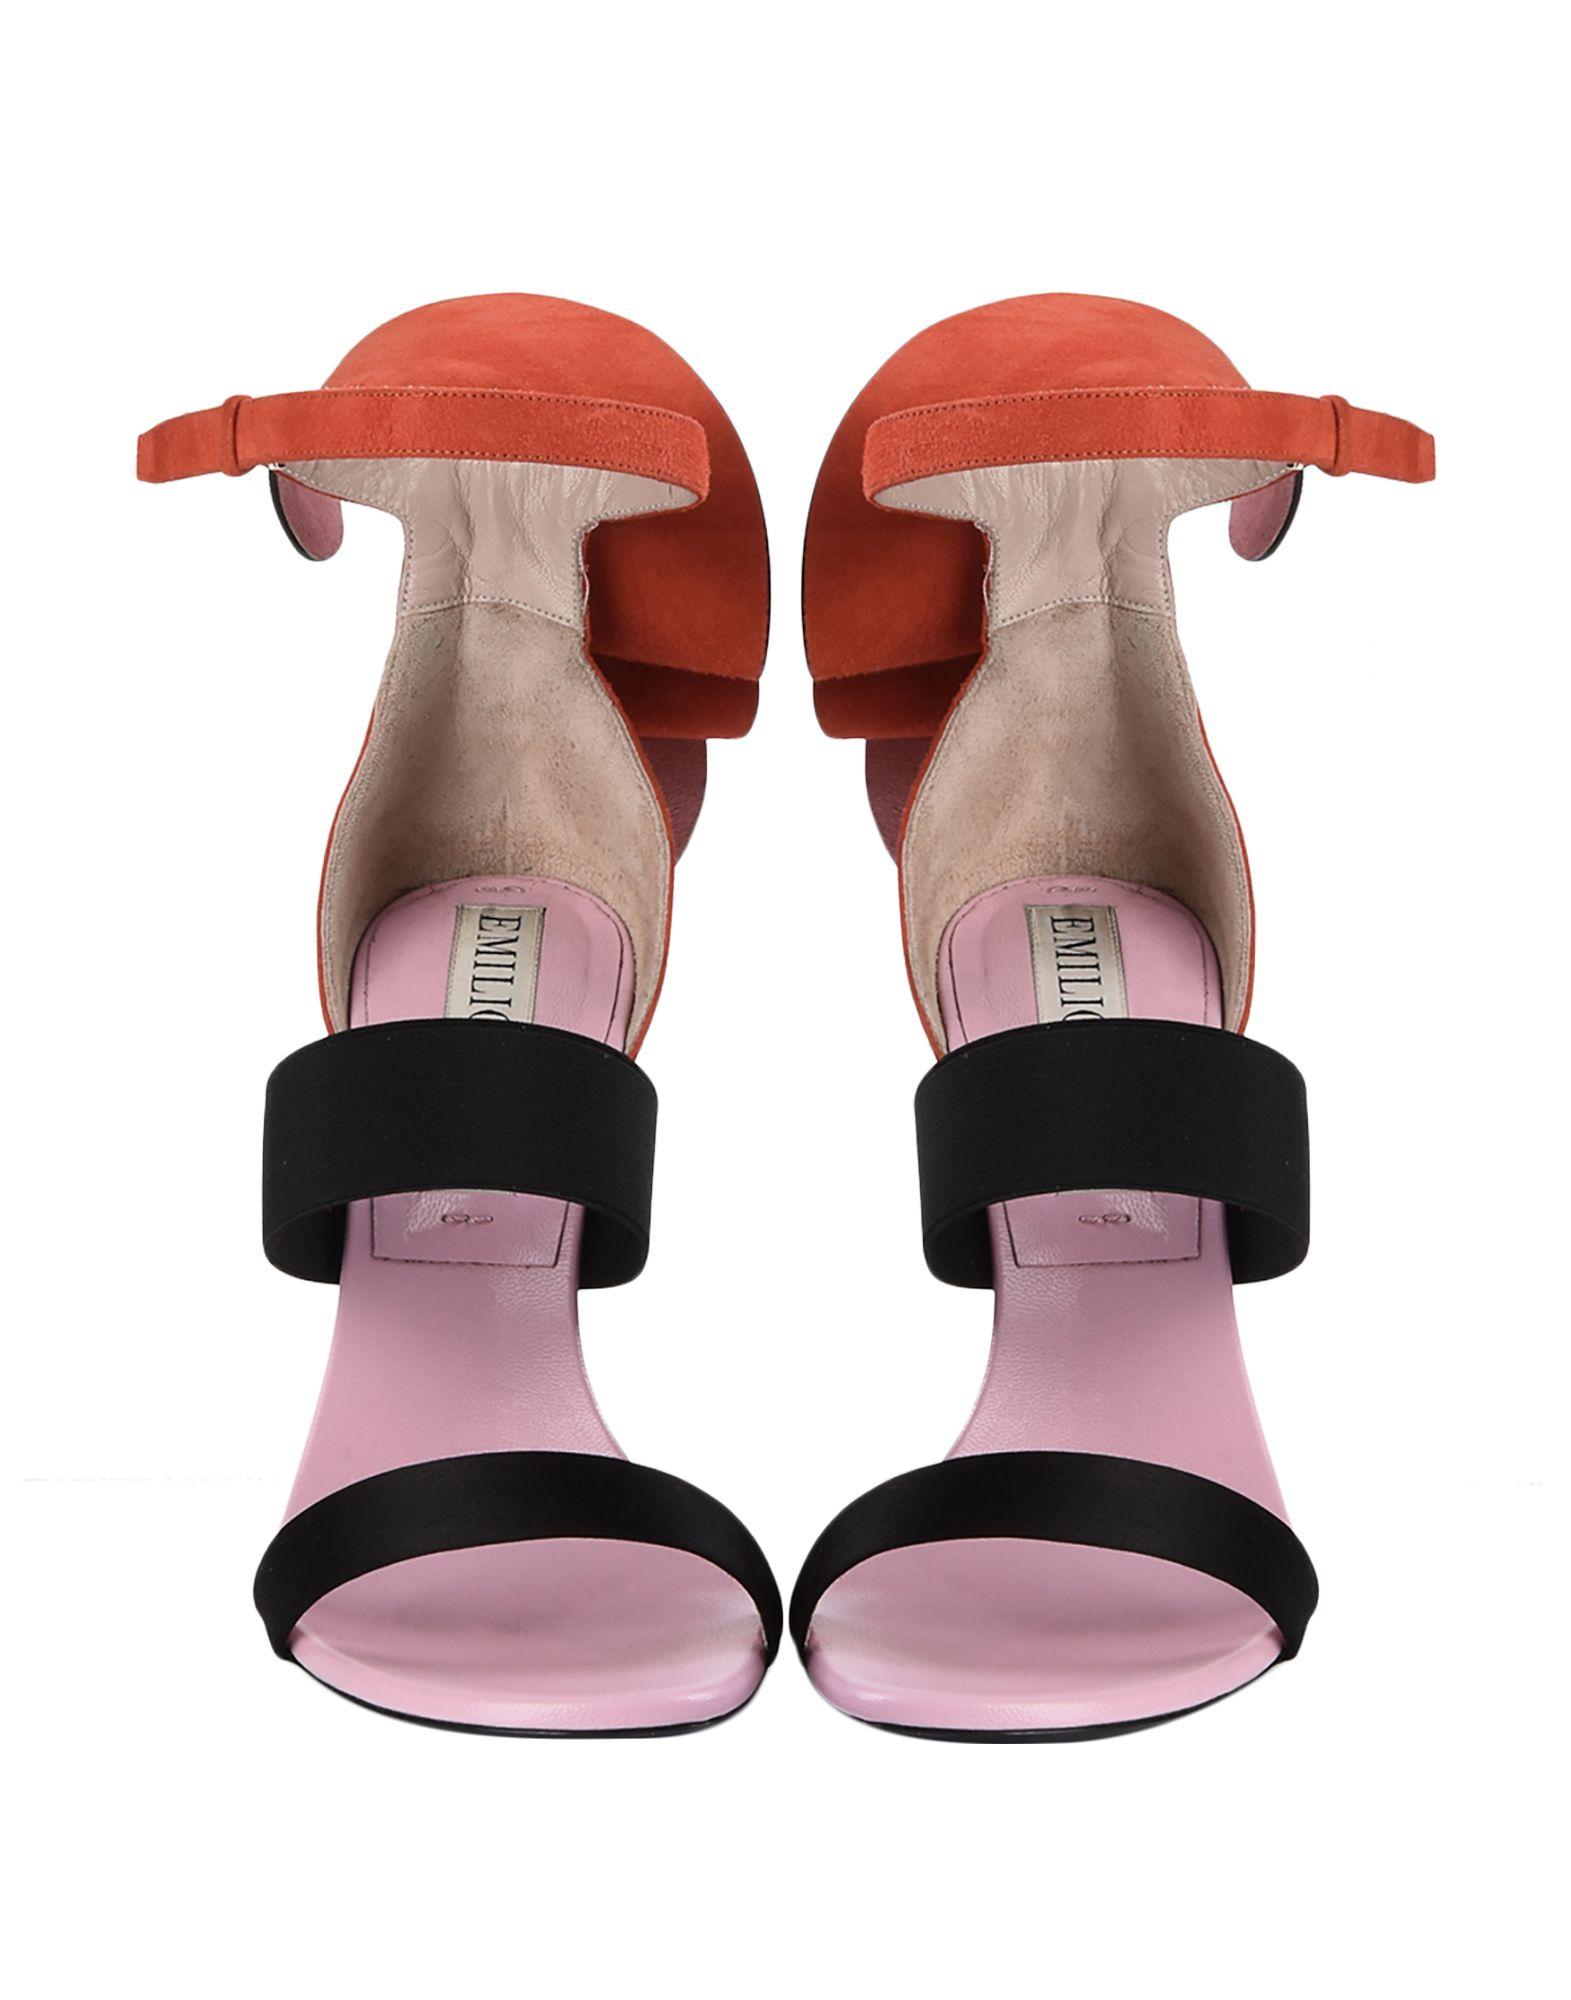 Rabatt Pucci Schuhe Emilio Pucci Rabatt Sandalen Damen  11548933TG f7aff7